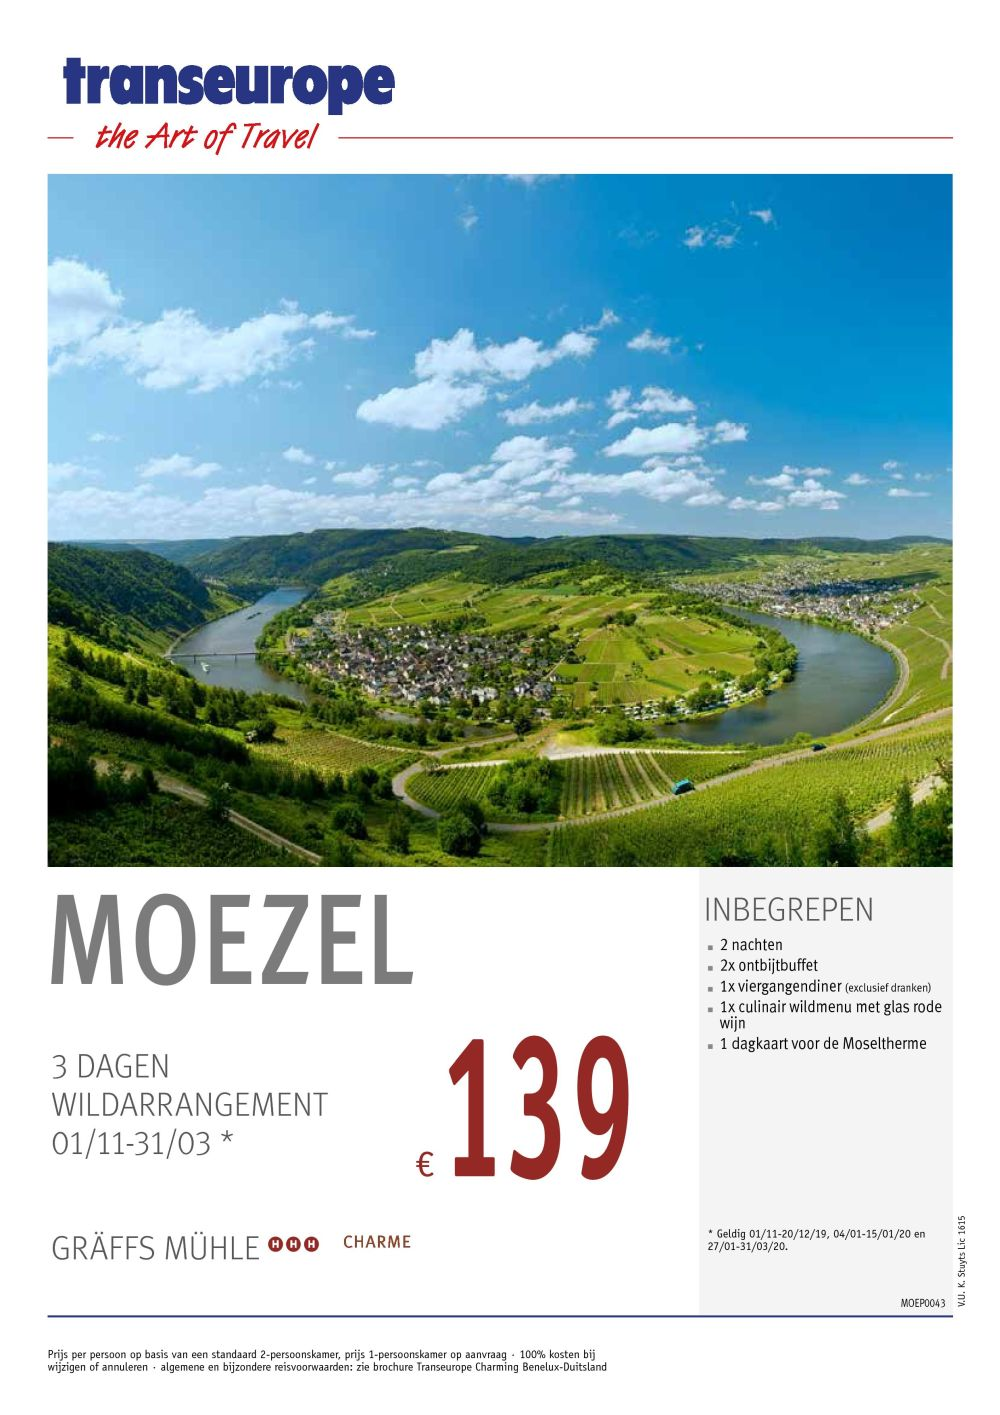 Last Minutes en Promoties - Transeurope - Moezel